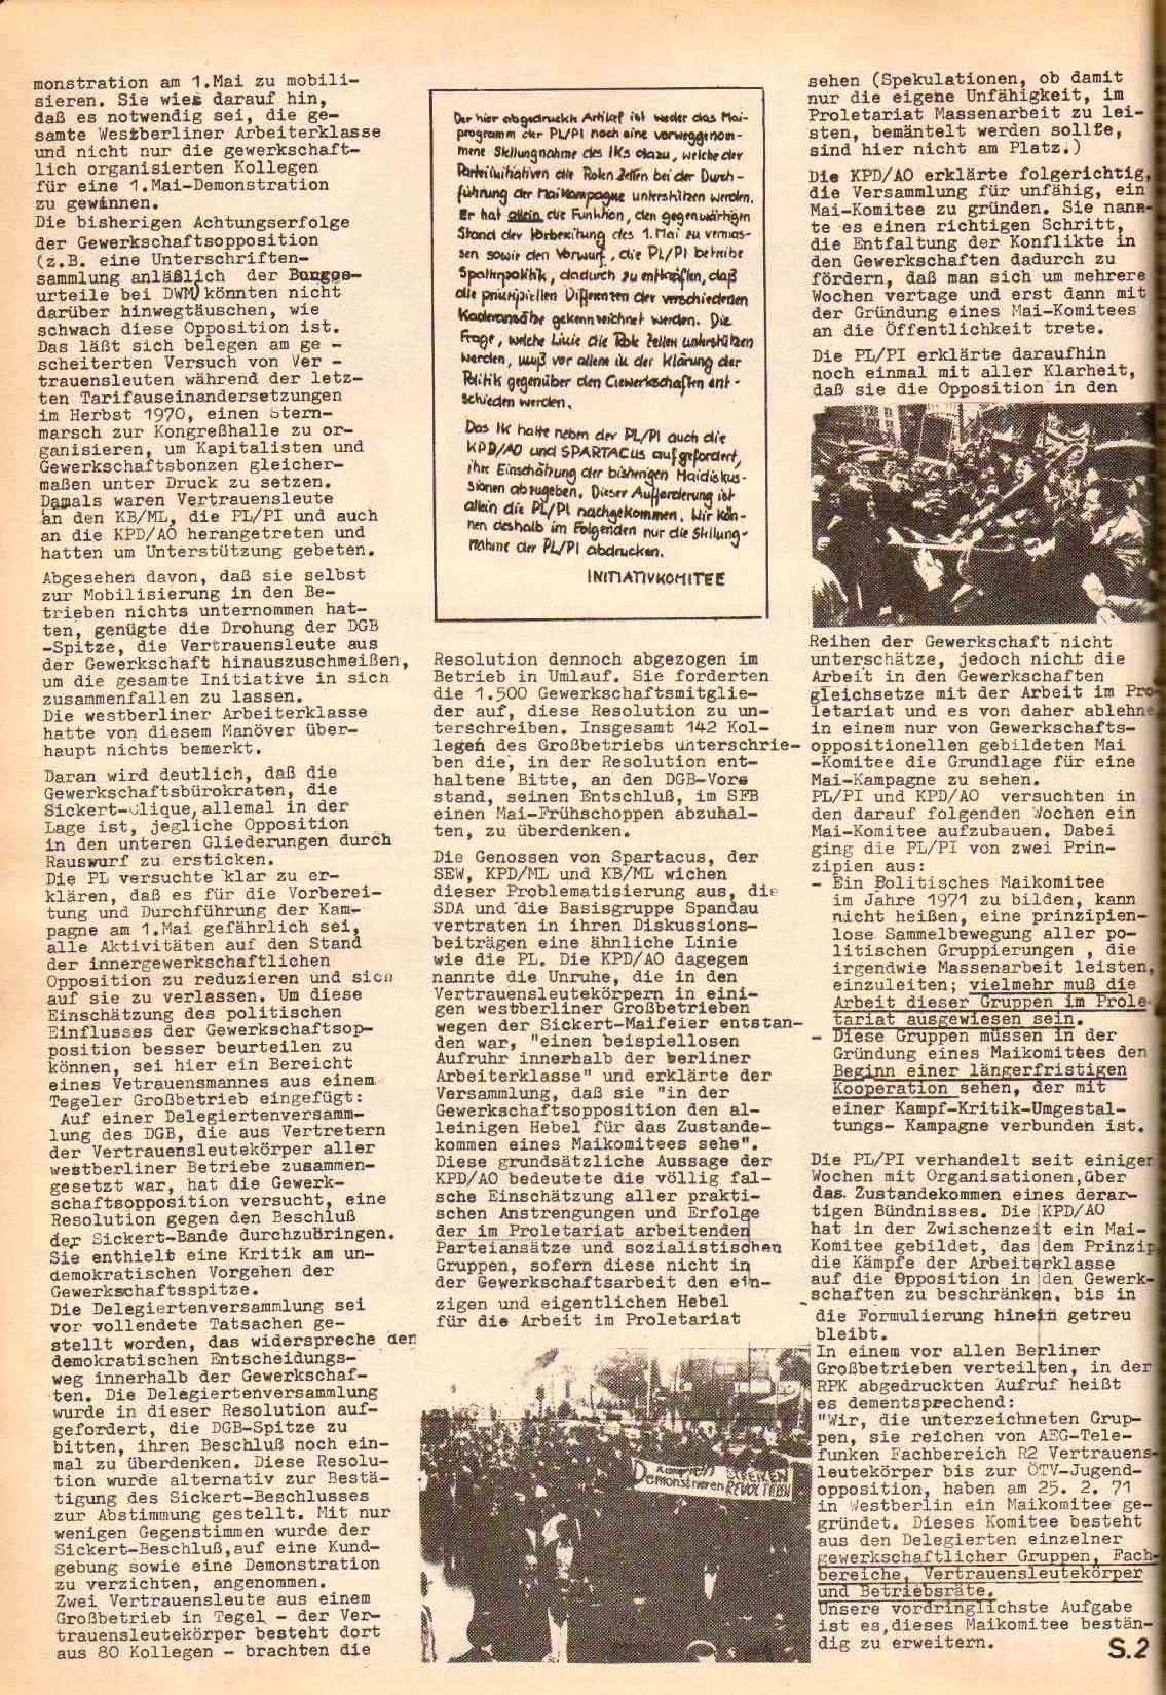 Berlin_Hochschulkampf_1971_04_02